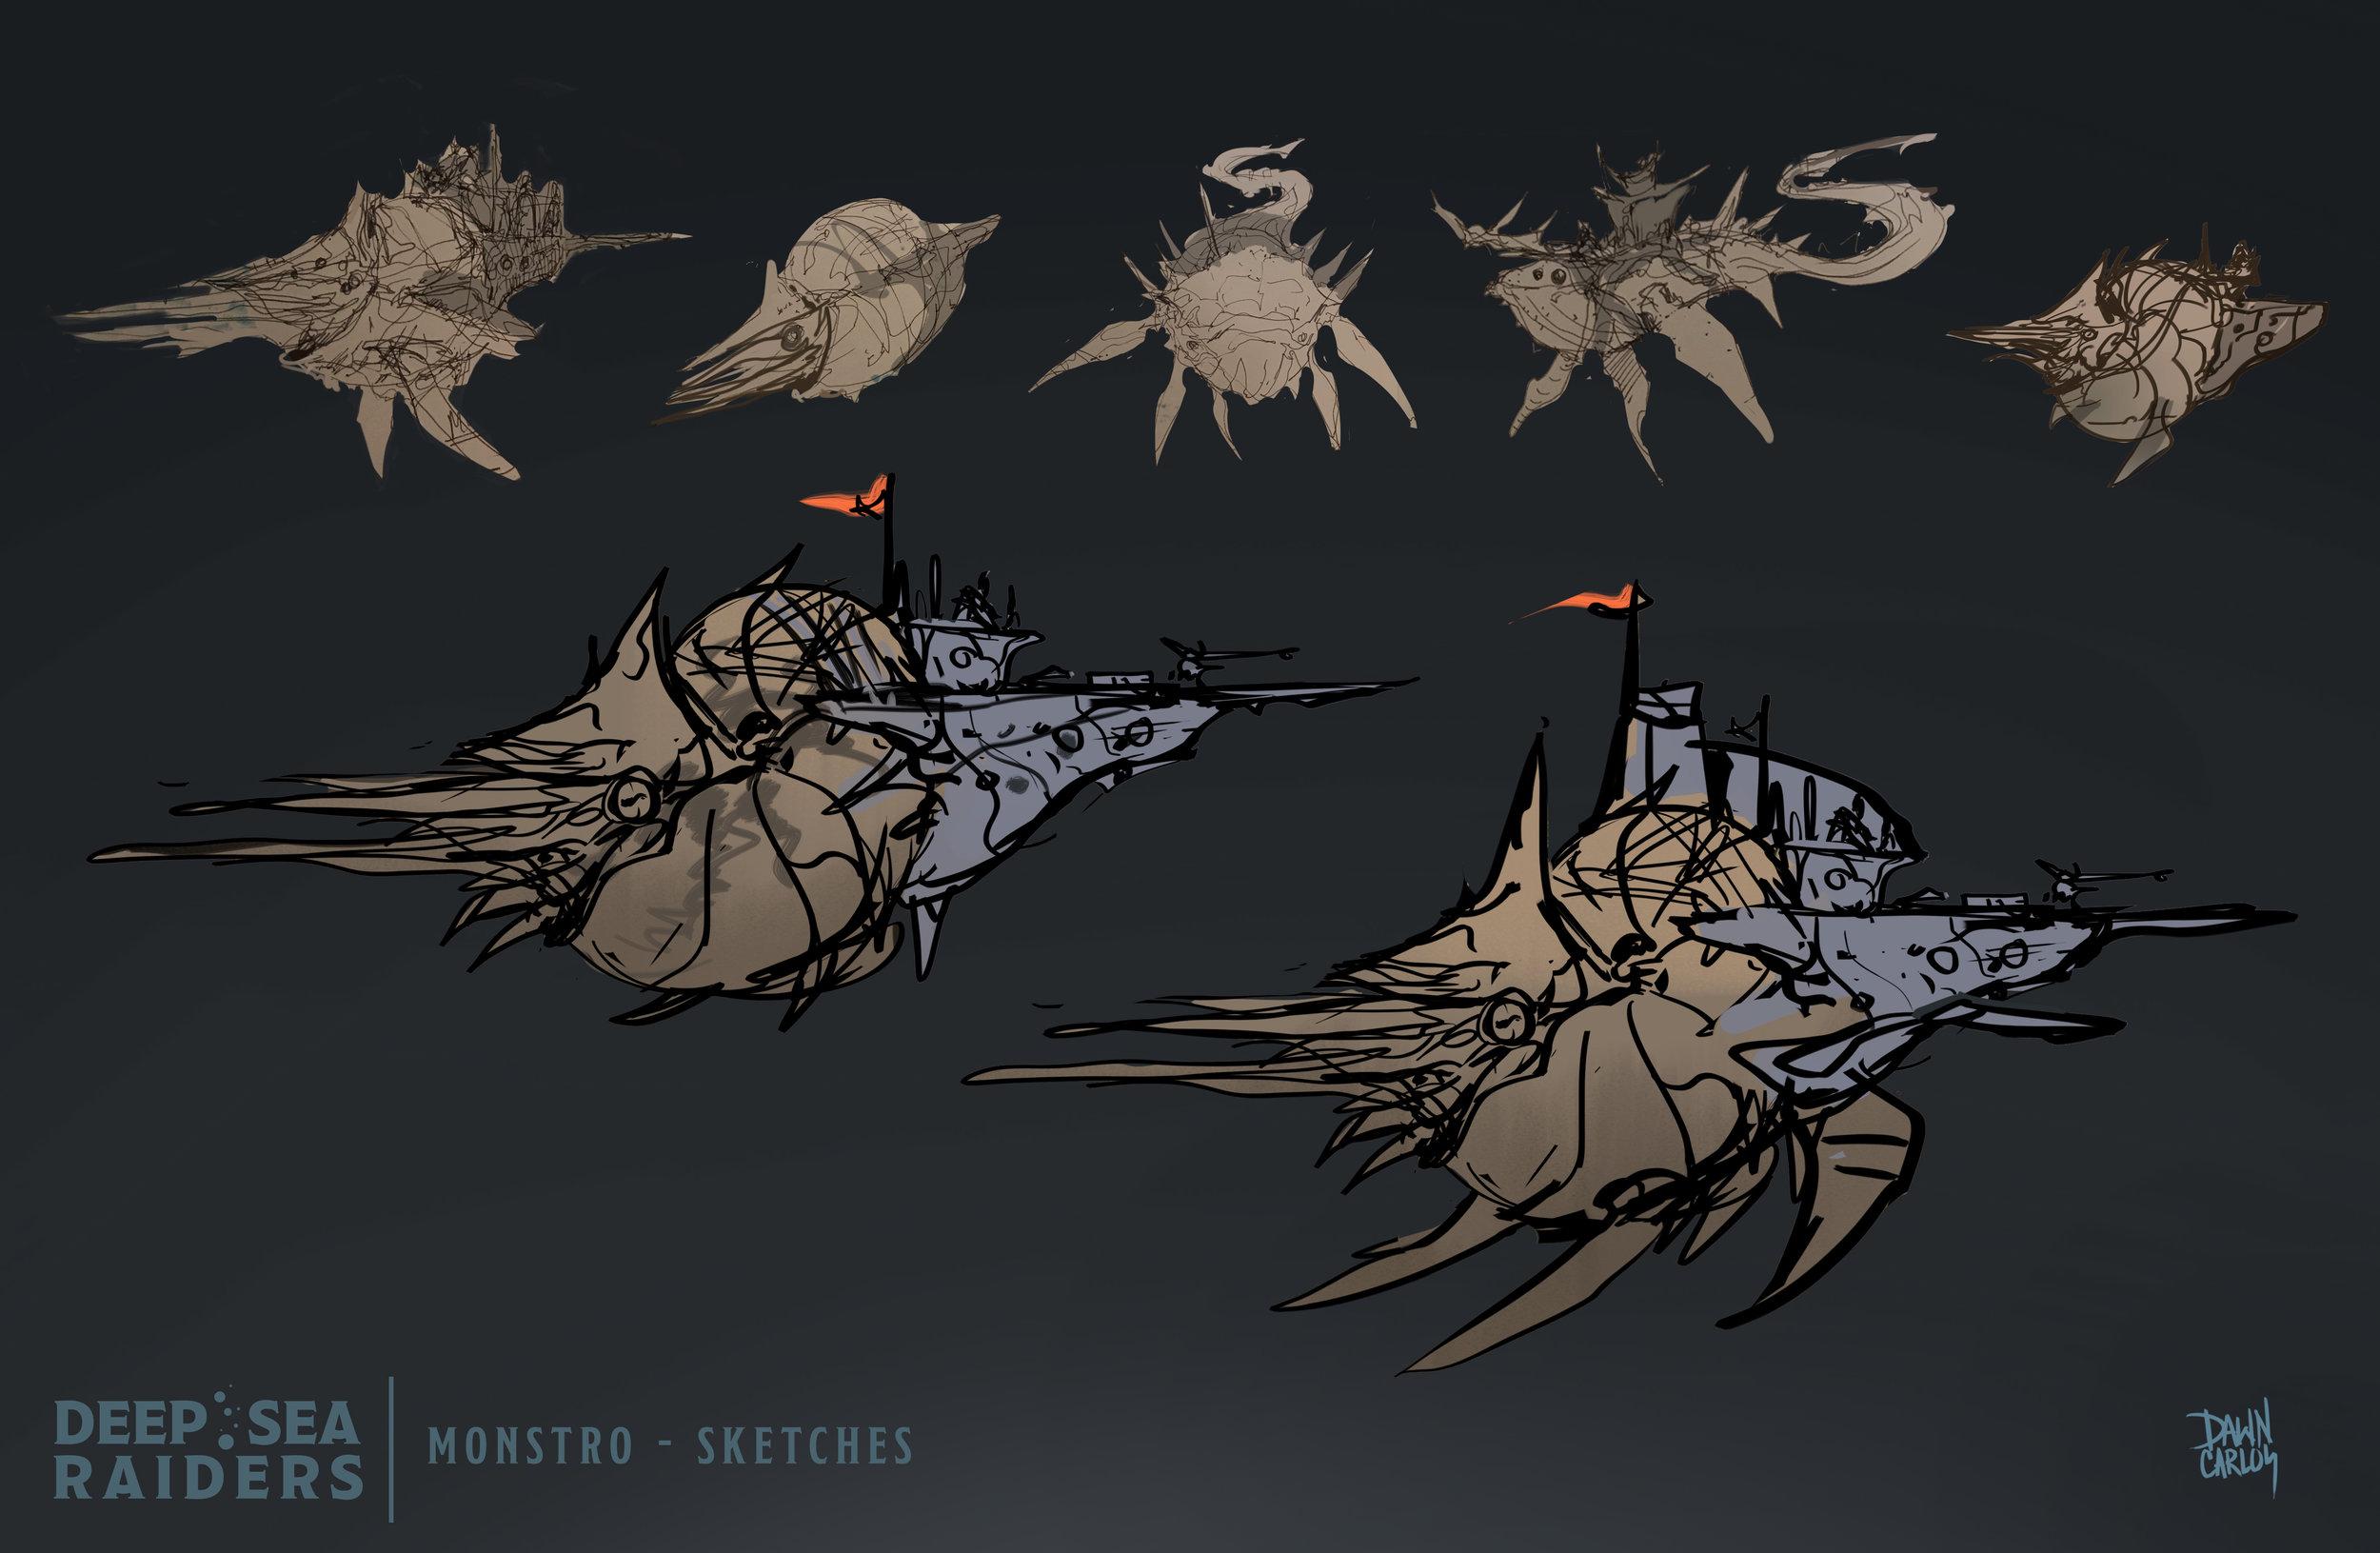 DeepSeaRaiders_MonstroSketches01.jpg